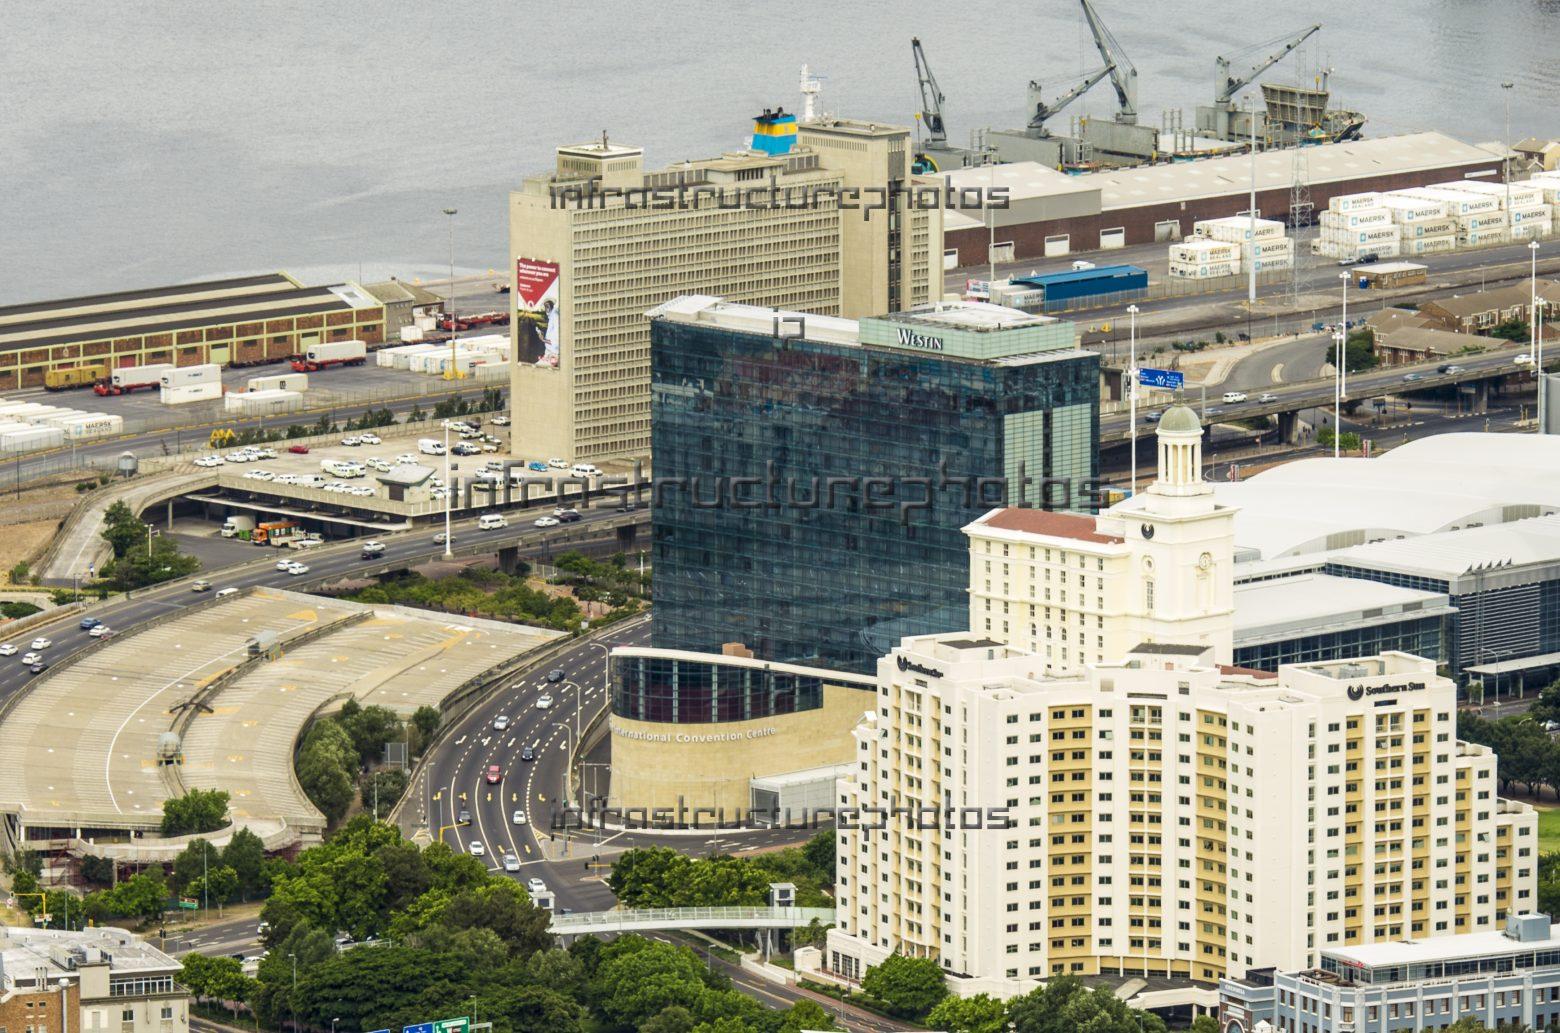 Cape Town International Conference Centre (CTICC) 2